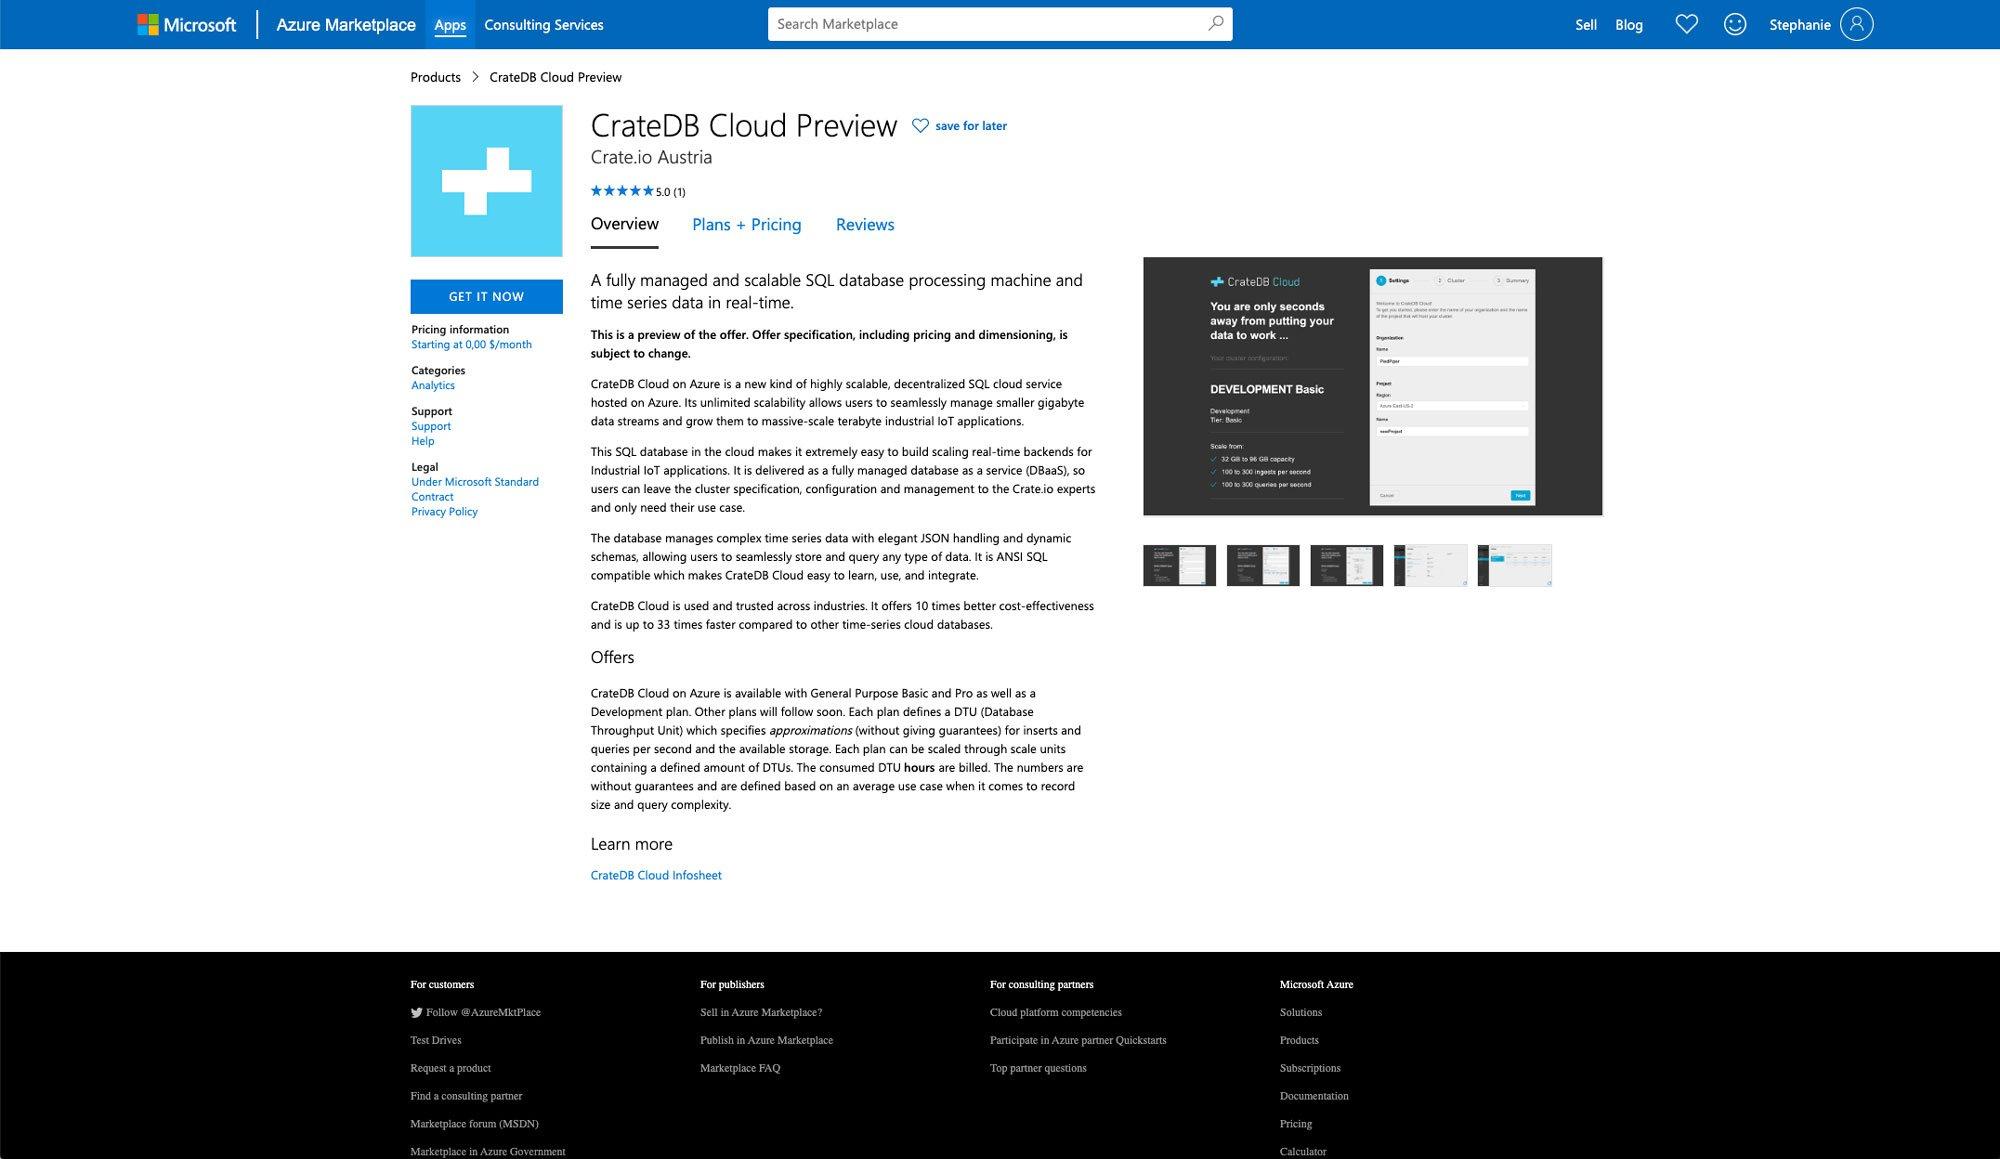 Deploying CrateDB Cloud via Azure Marketplace